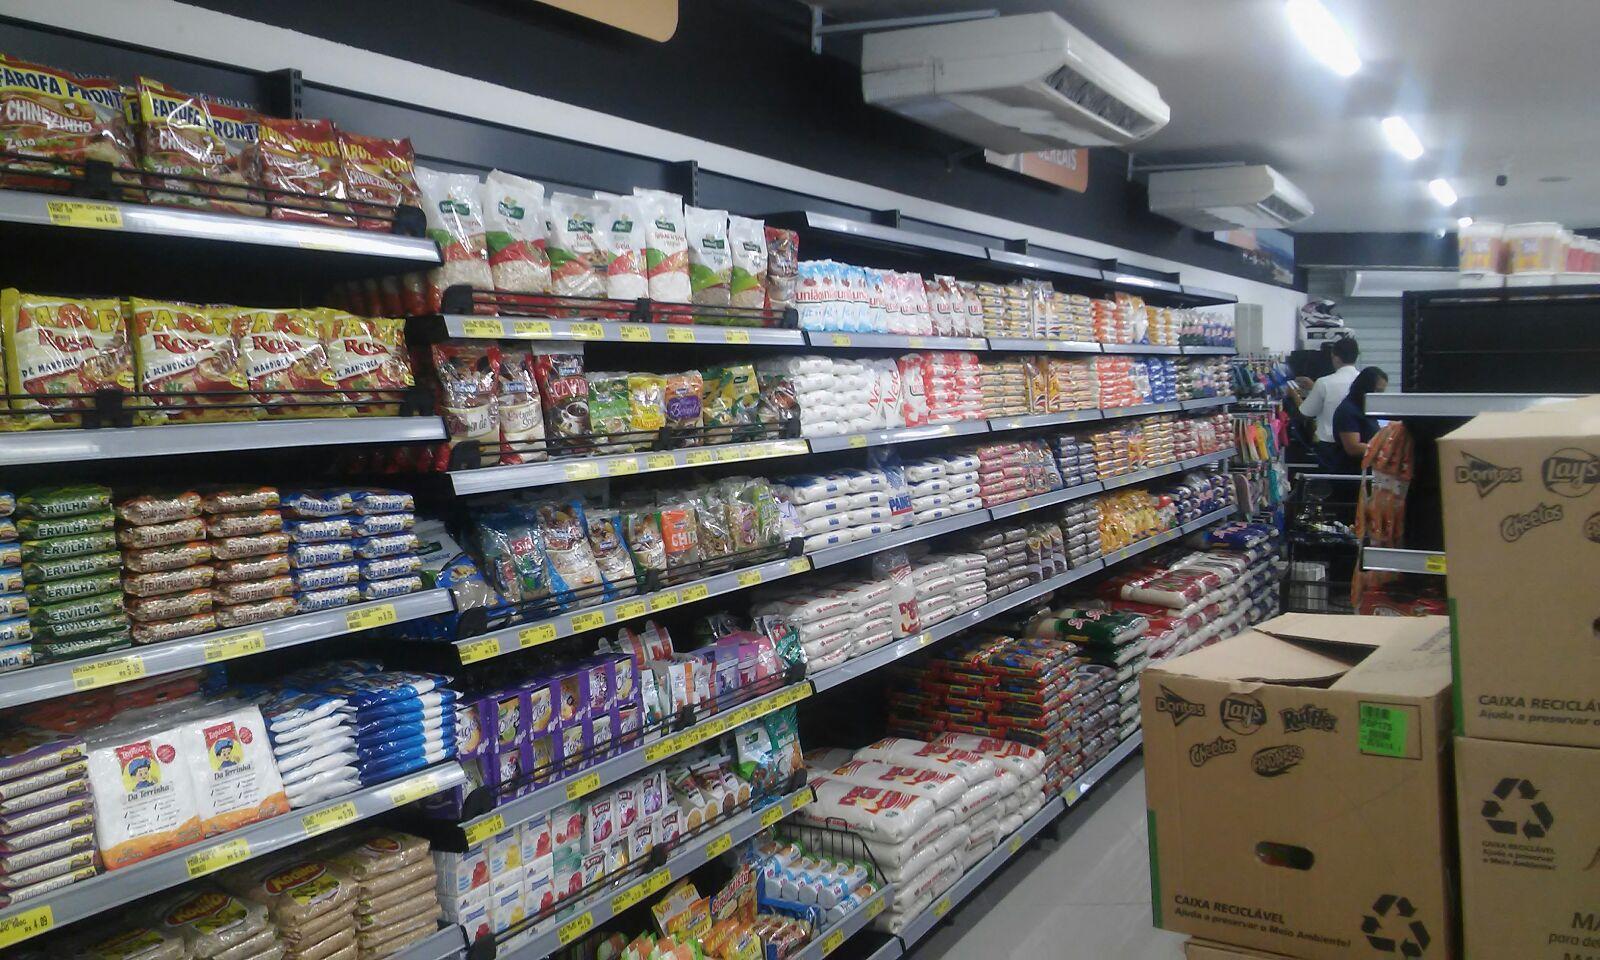 Fernando Armario Muñoz ~ Nova Loja Supermercado Talon Rio das Ostras RJ Blog